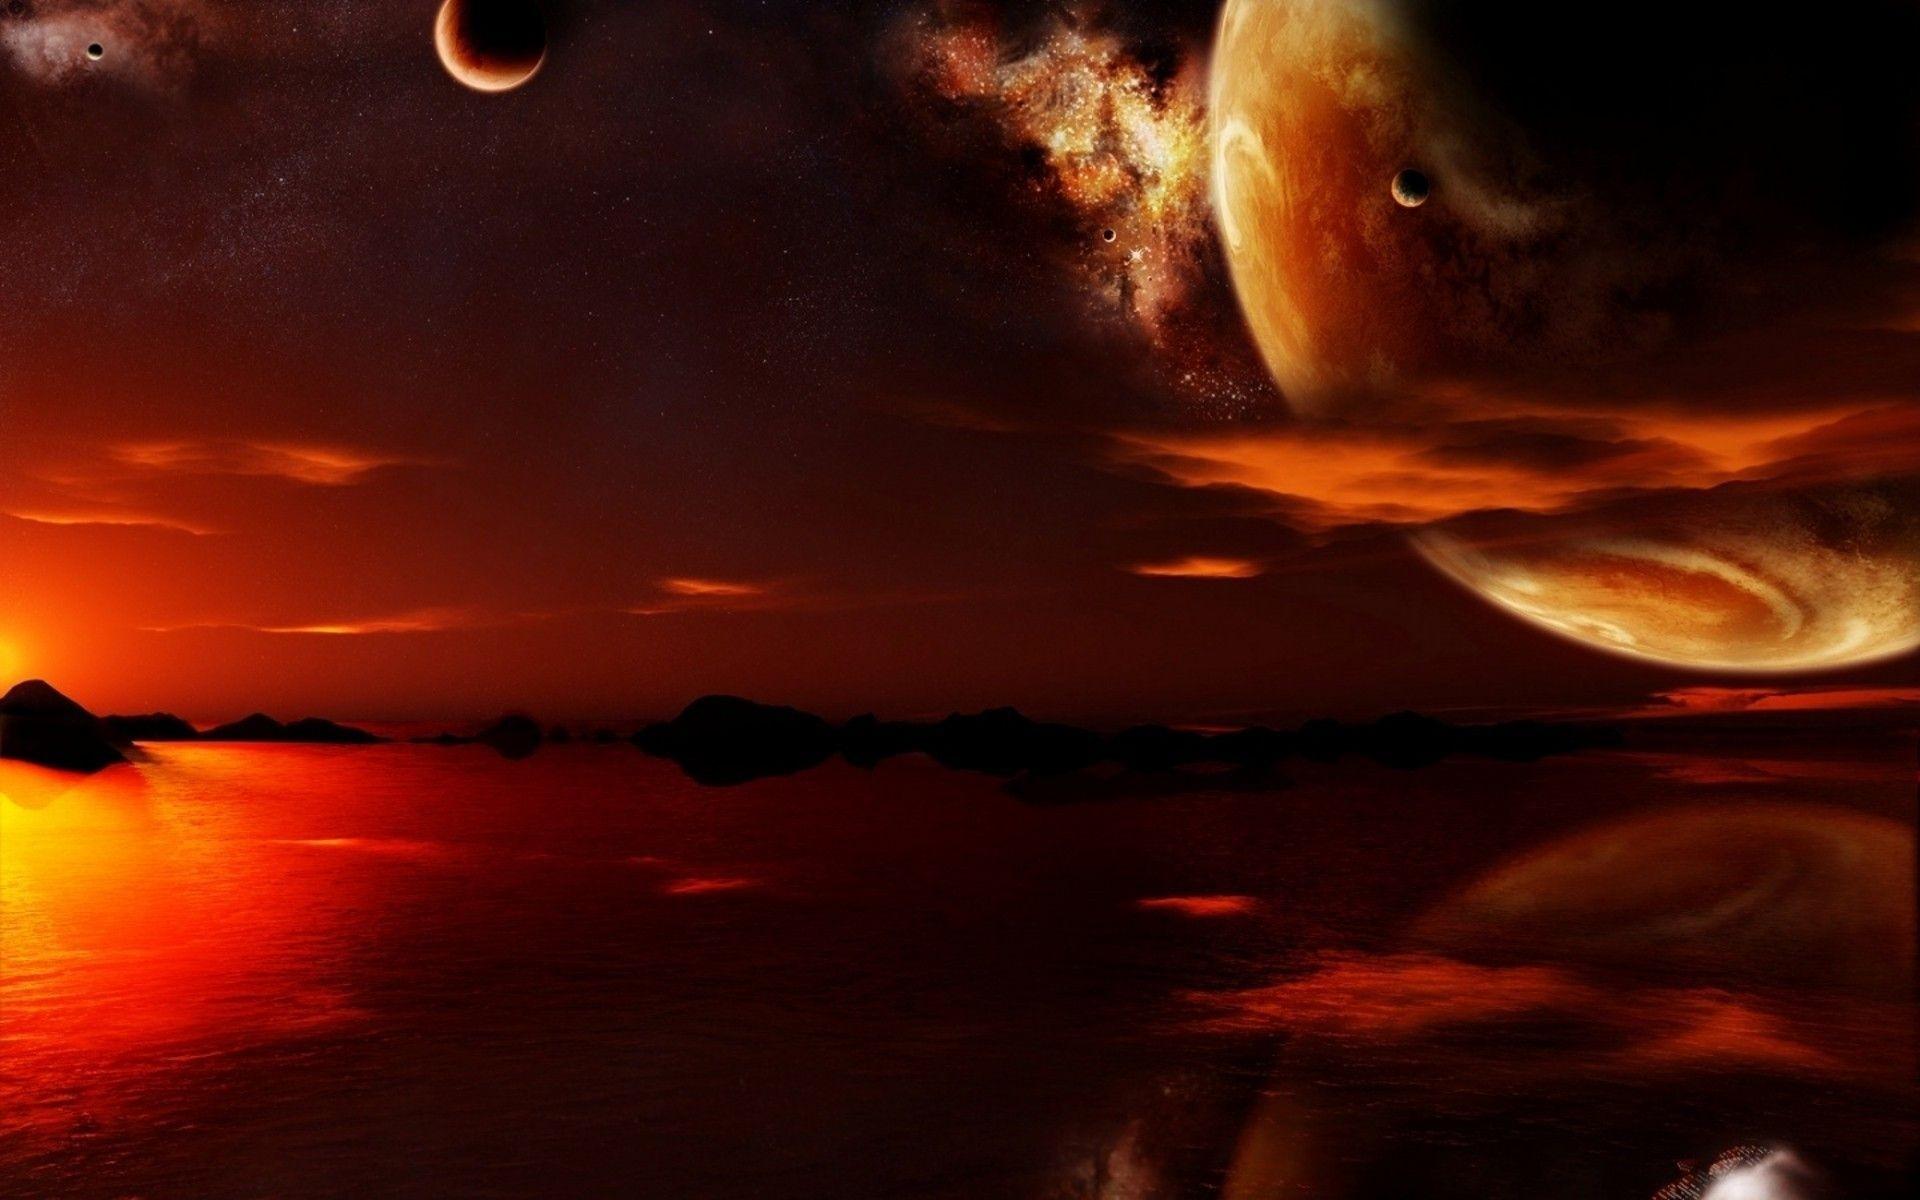 Red planet, moon, sky, lake, sunset, fantasy, HD .